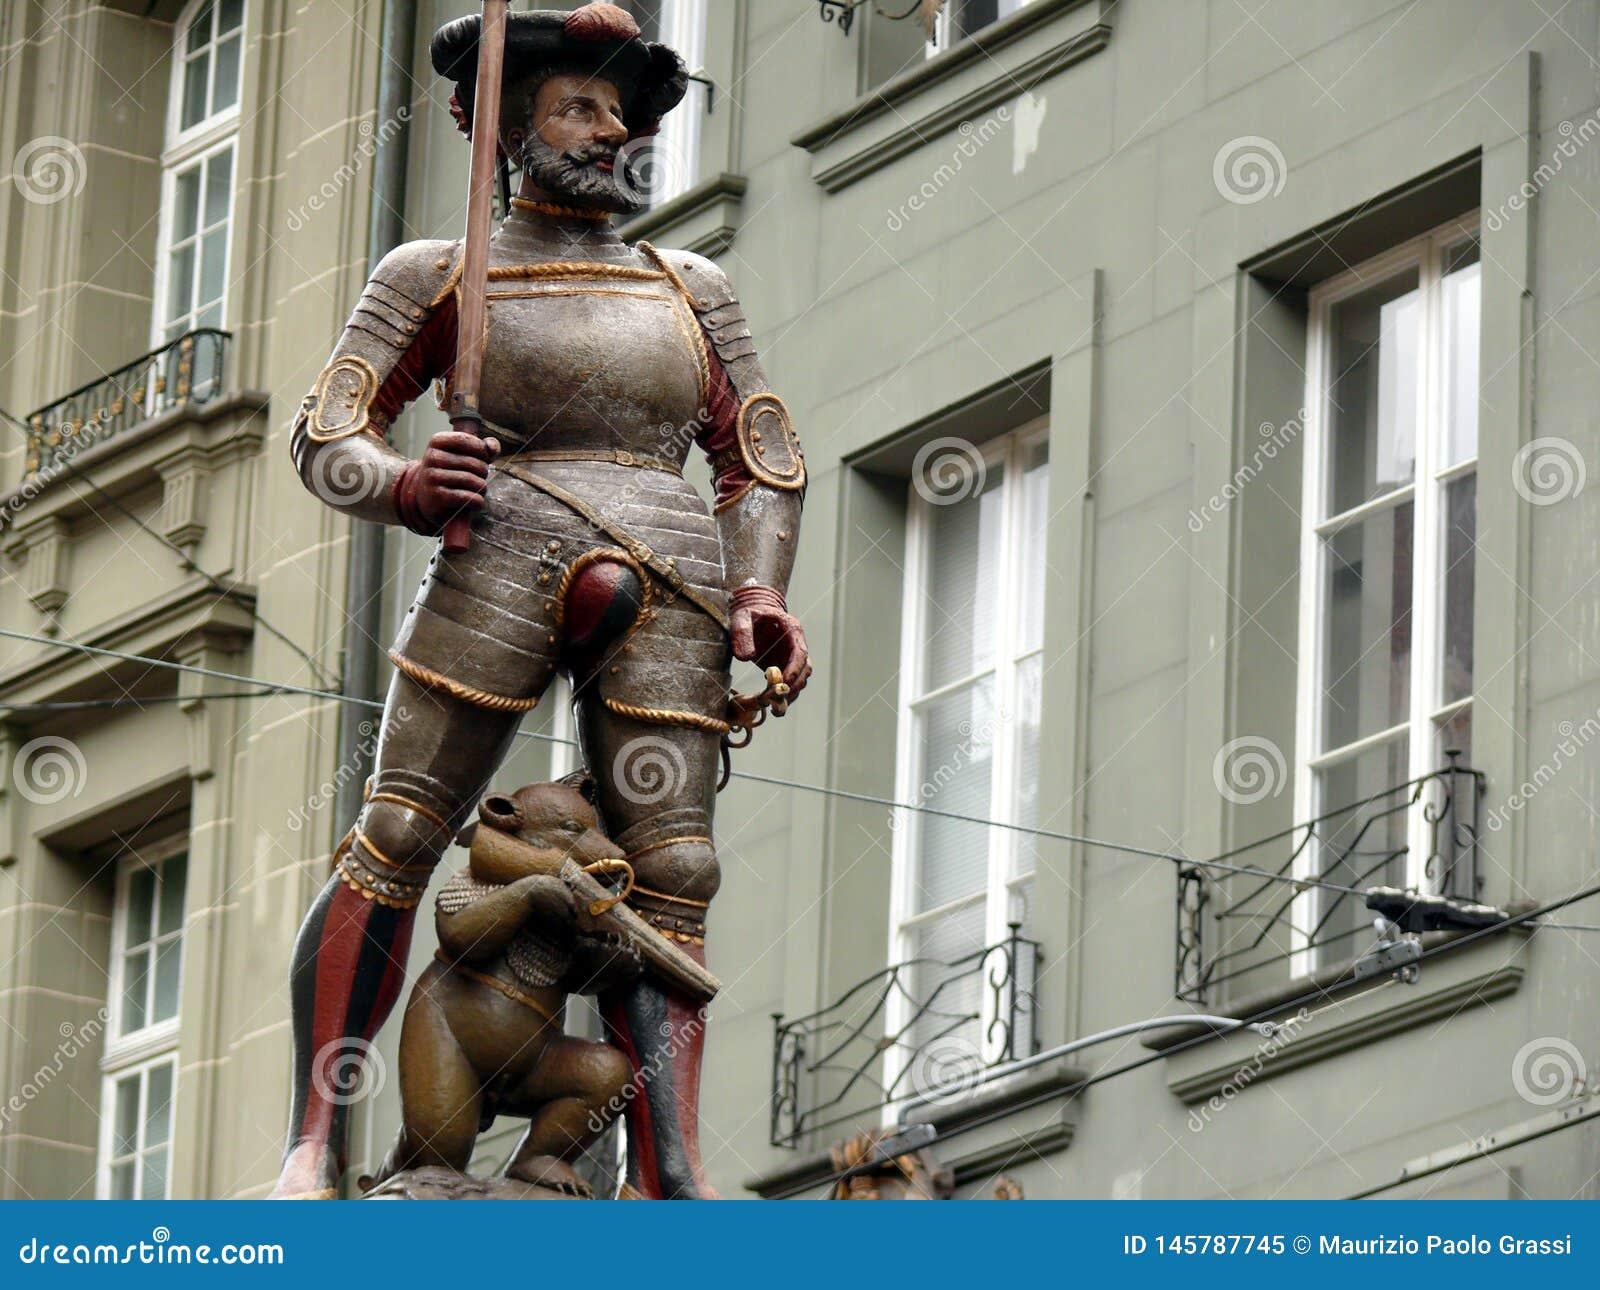 Bern, Switzerland. 08/02/2009. Bear monument with hunting rifle